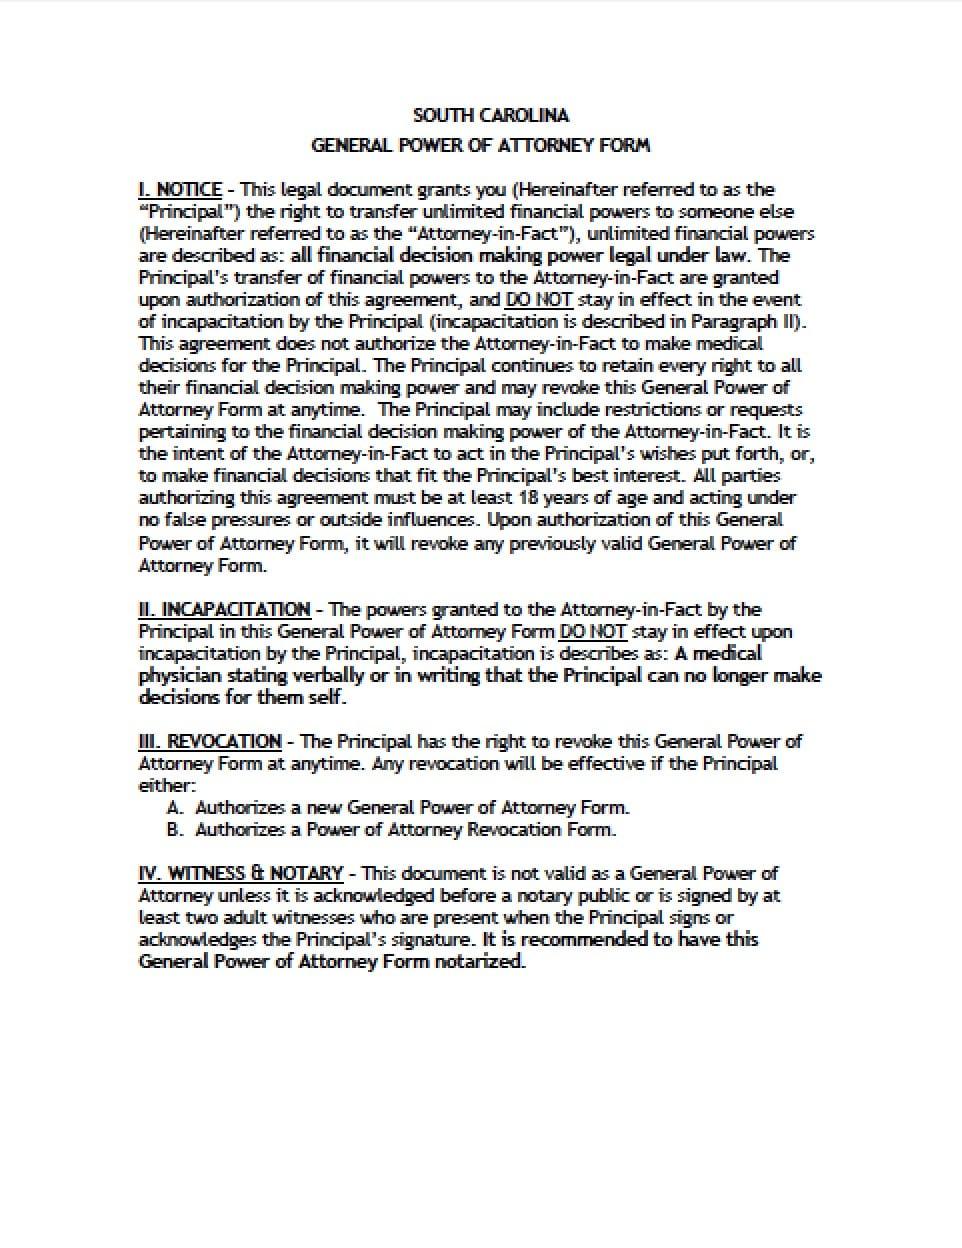 power of attorney form 2019  South Carolina General Financial Power of Attorney Form ...